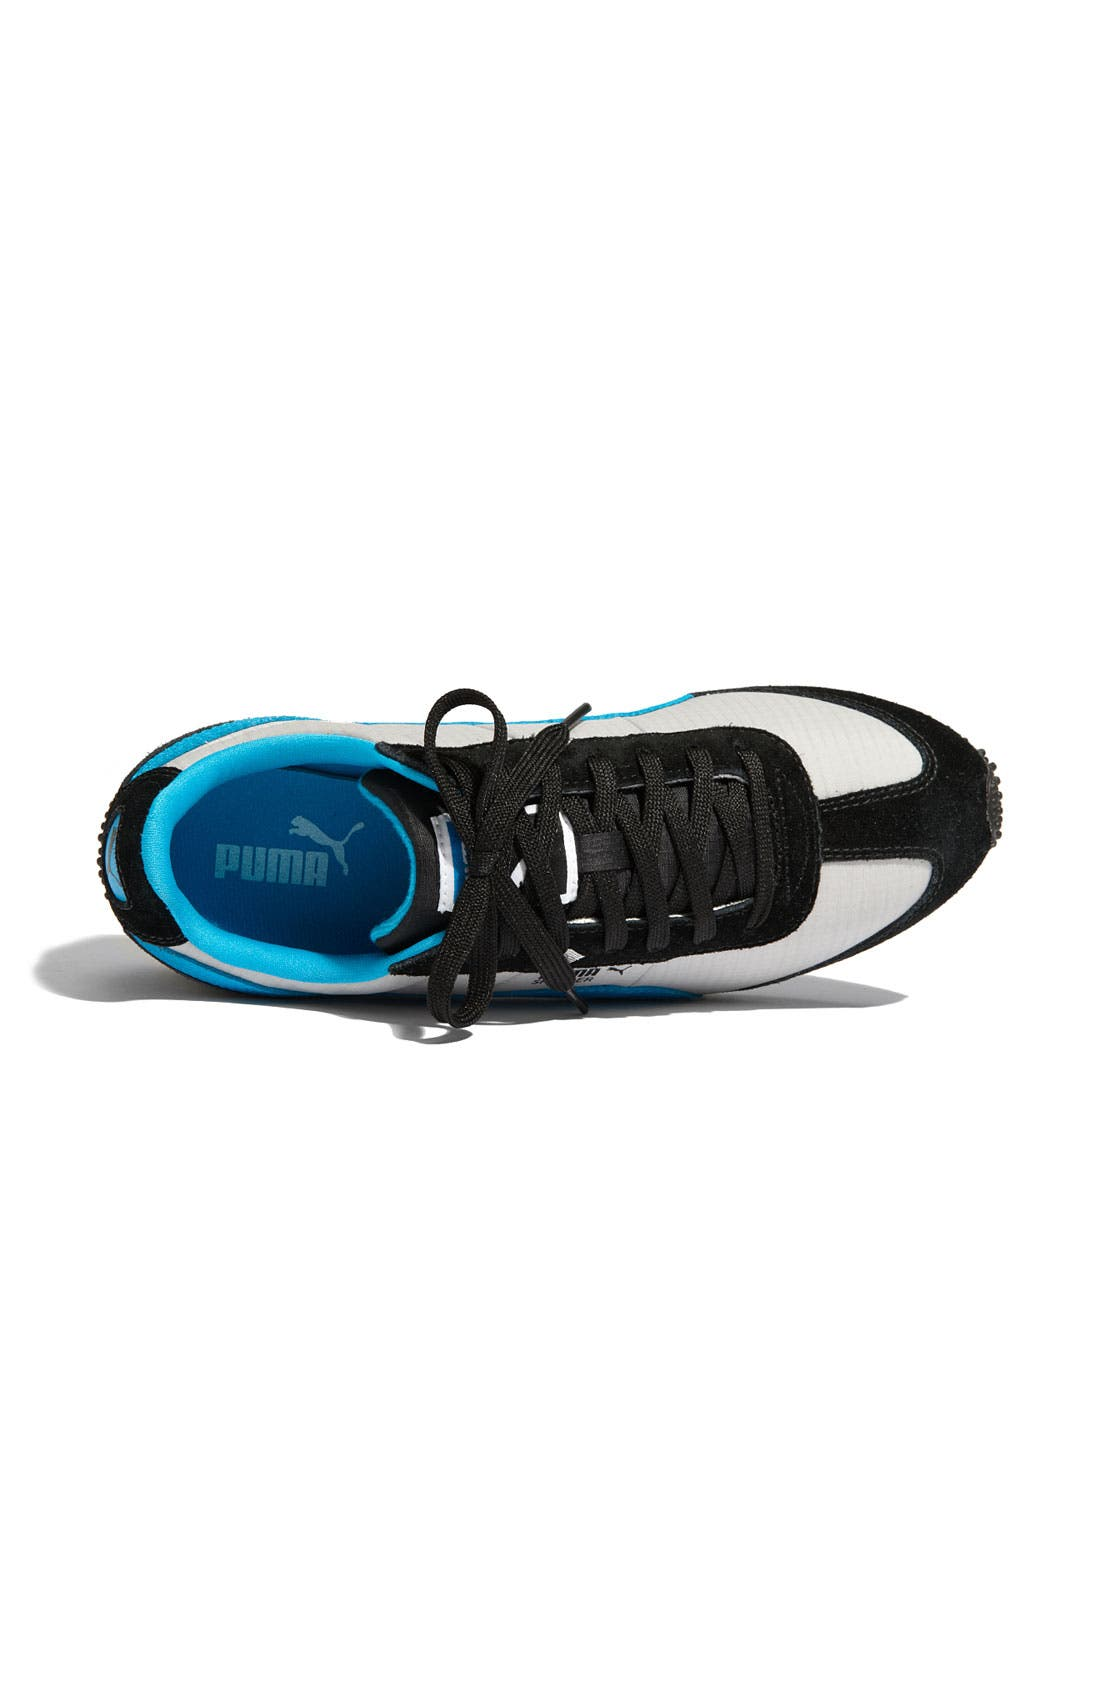 PUMA,                             'Speeder' Sneaker,                             Alternate thumbnail 4, color,                             001